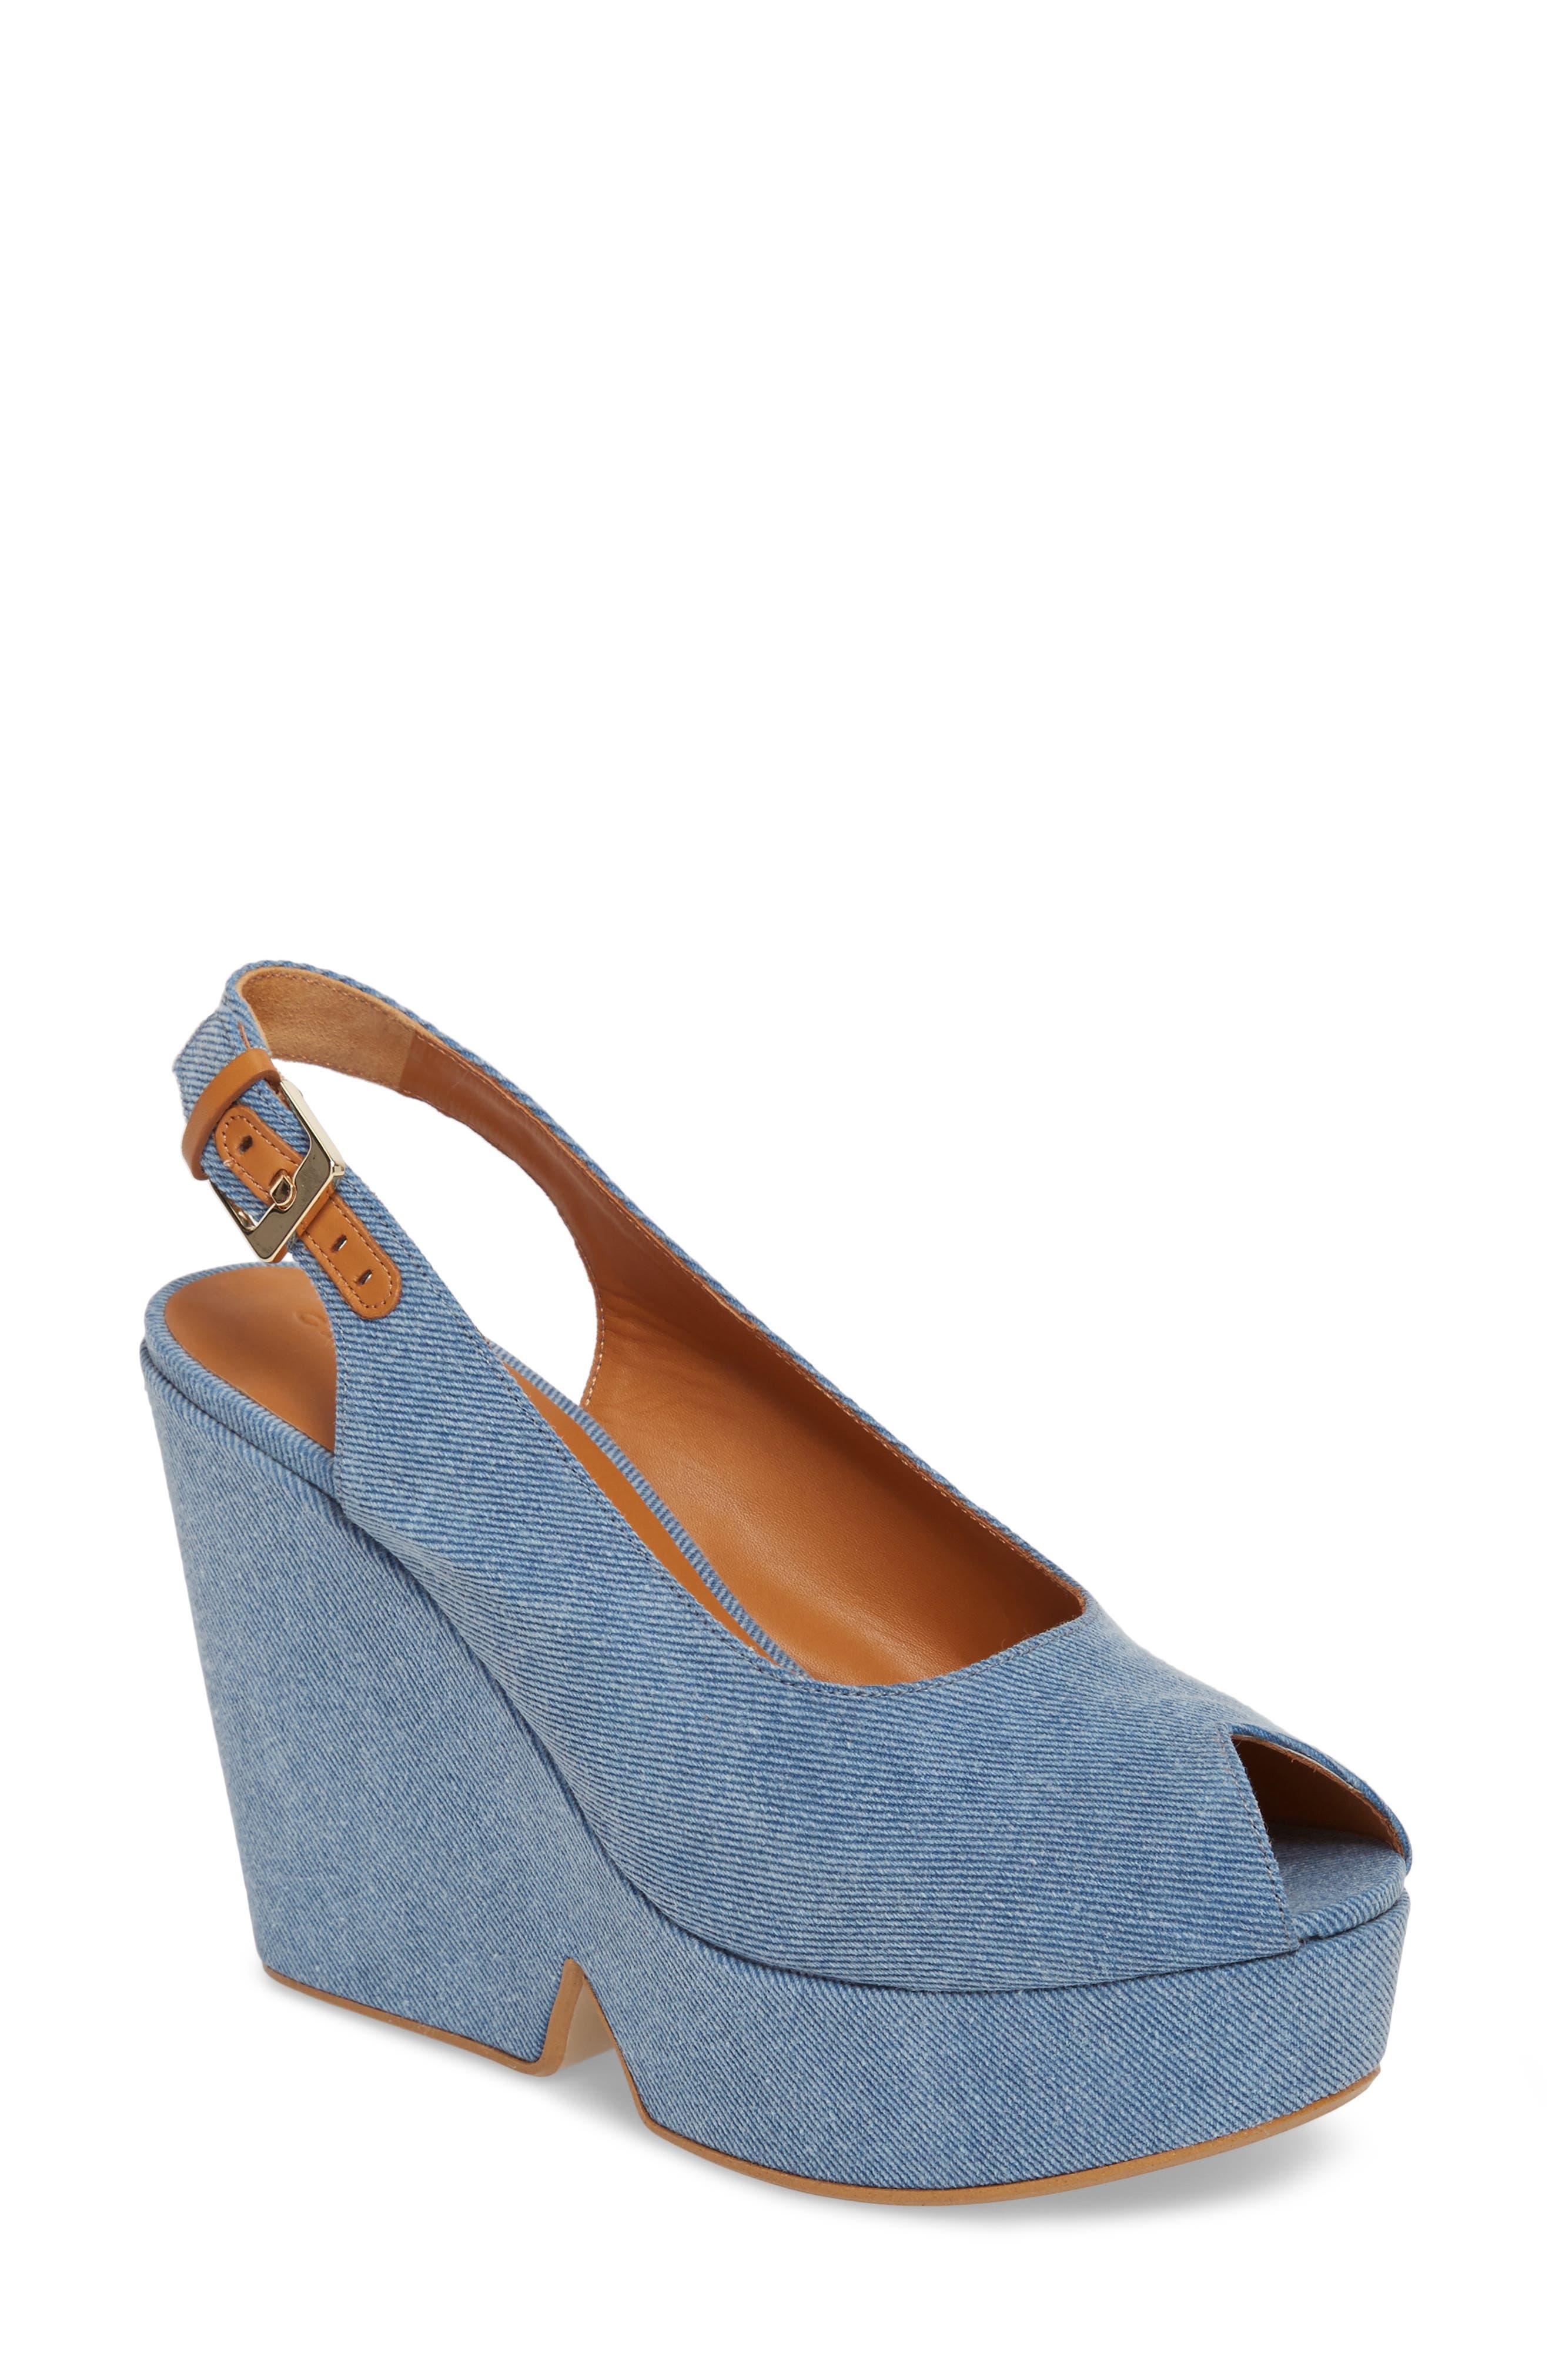 Dylanto Platform Wedge Sandal,                             Main thumbnail 1, color,                             400